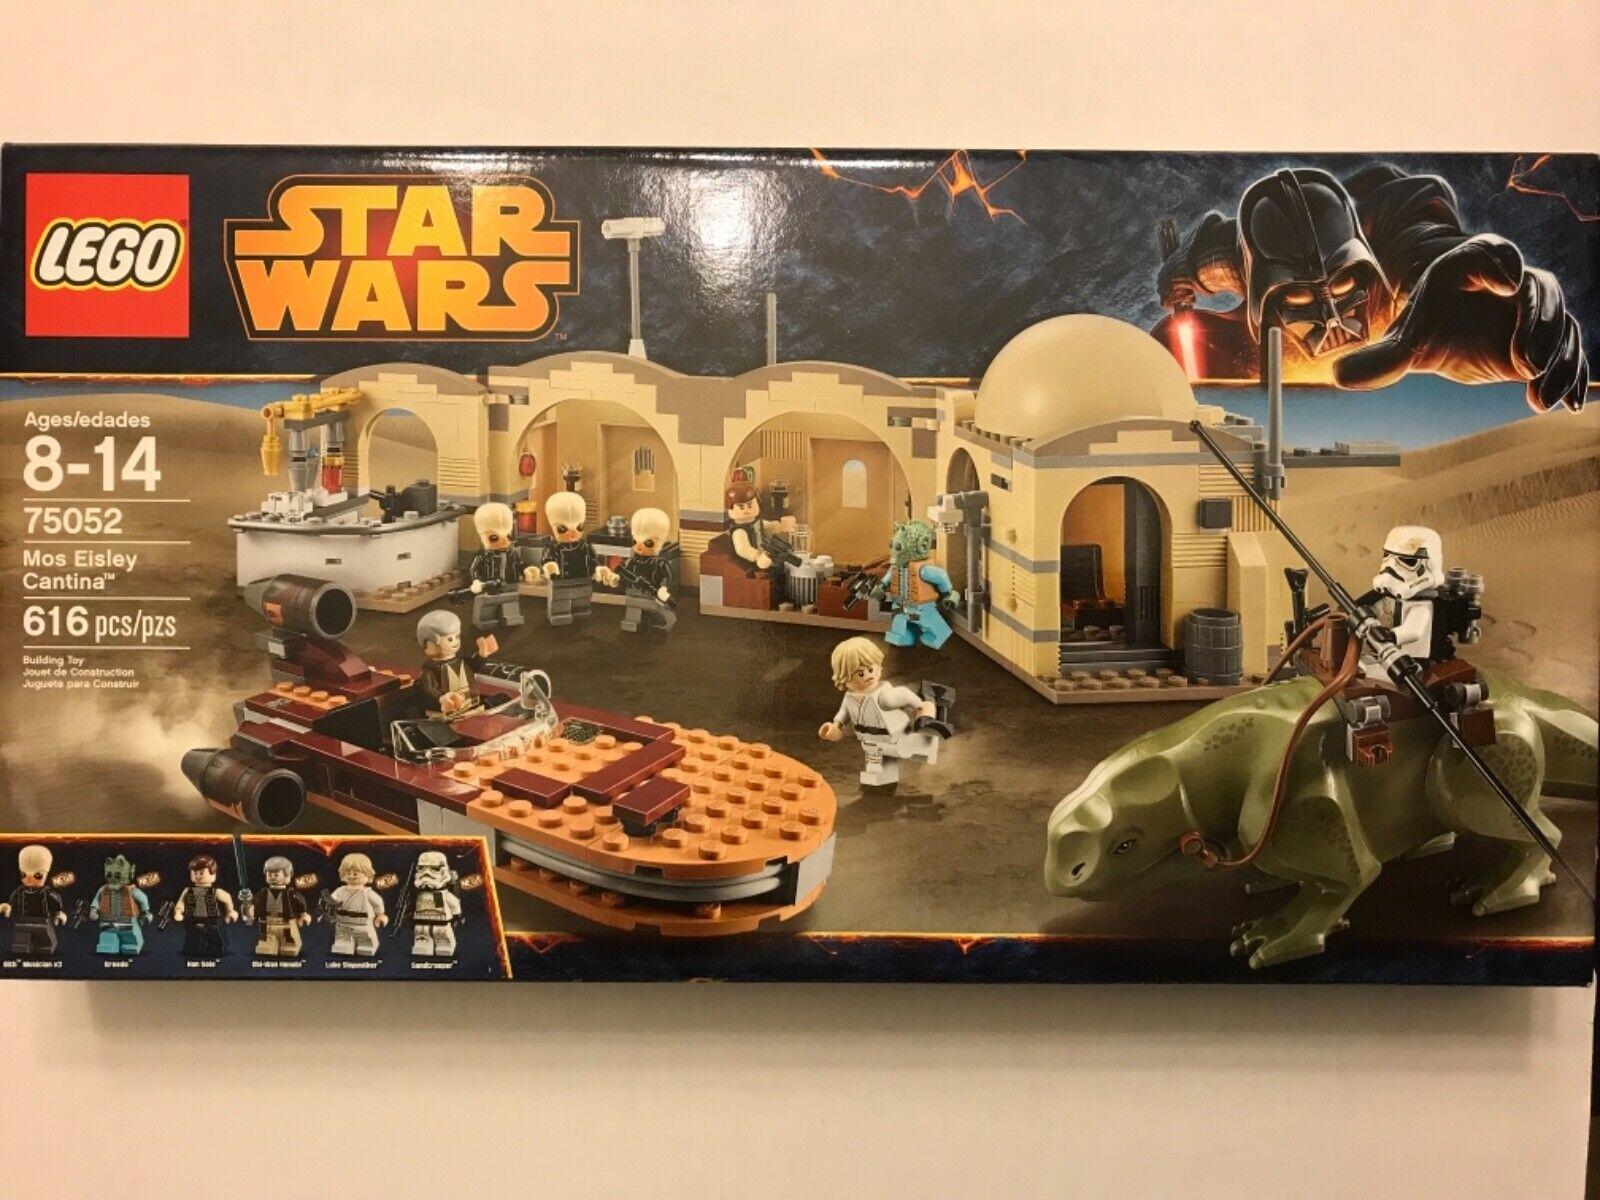 NEW Lego Star Wars Mos Eisley Cantina 75052